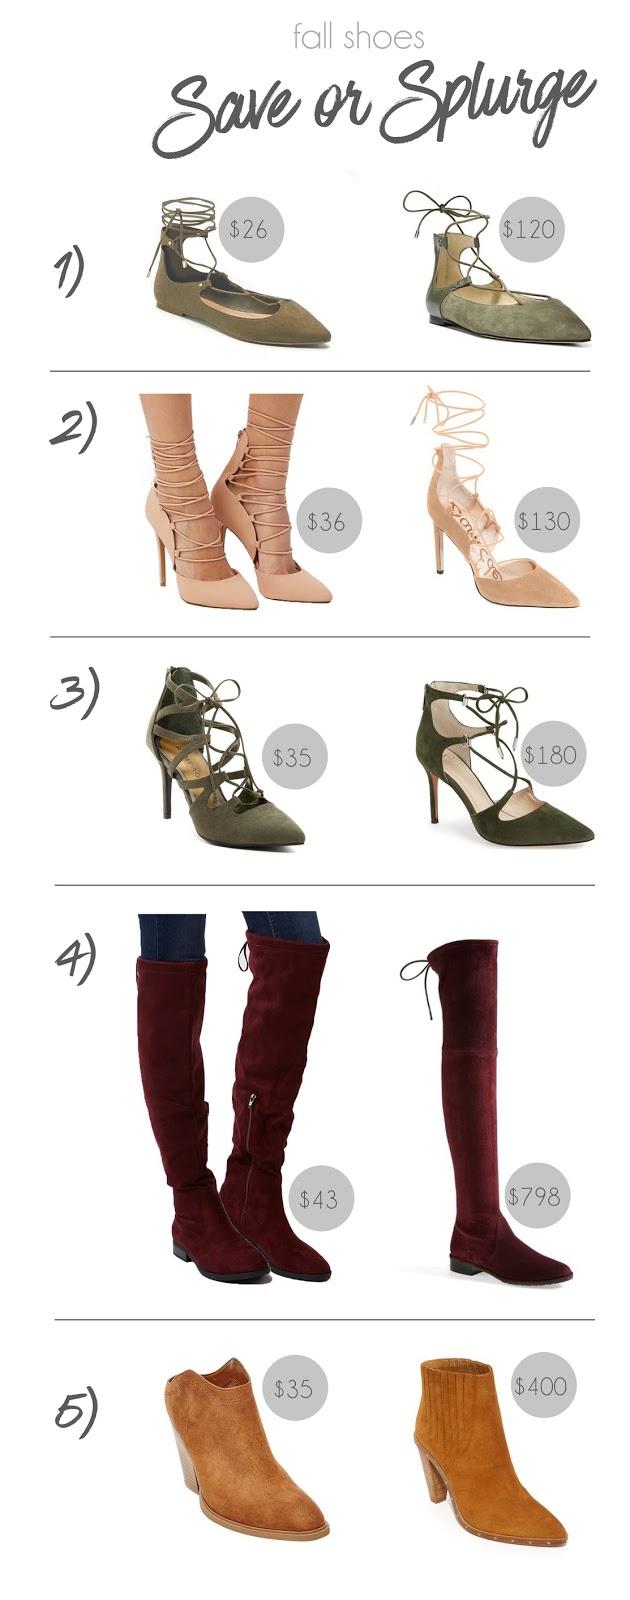 top-shoes-for-fall-2016-dupes-steals-designer-knockoffs-blogger